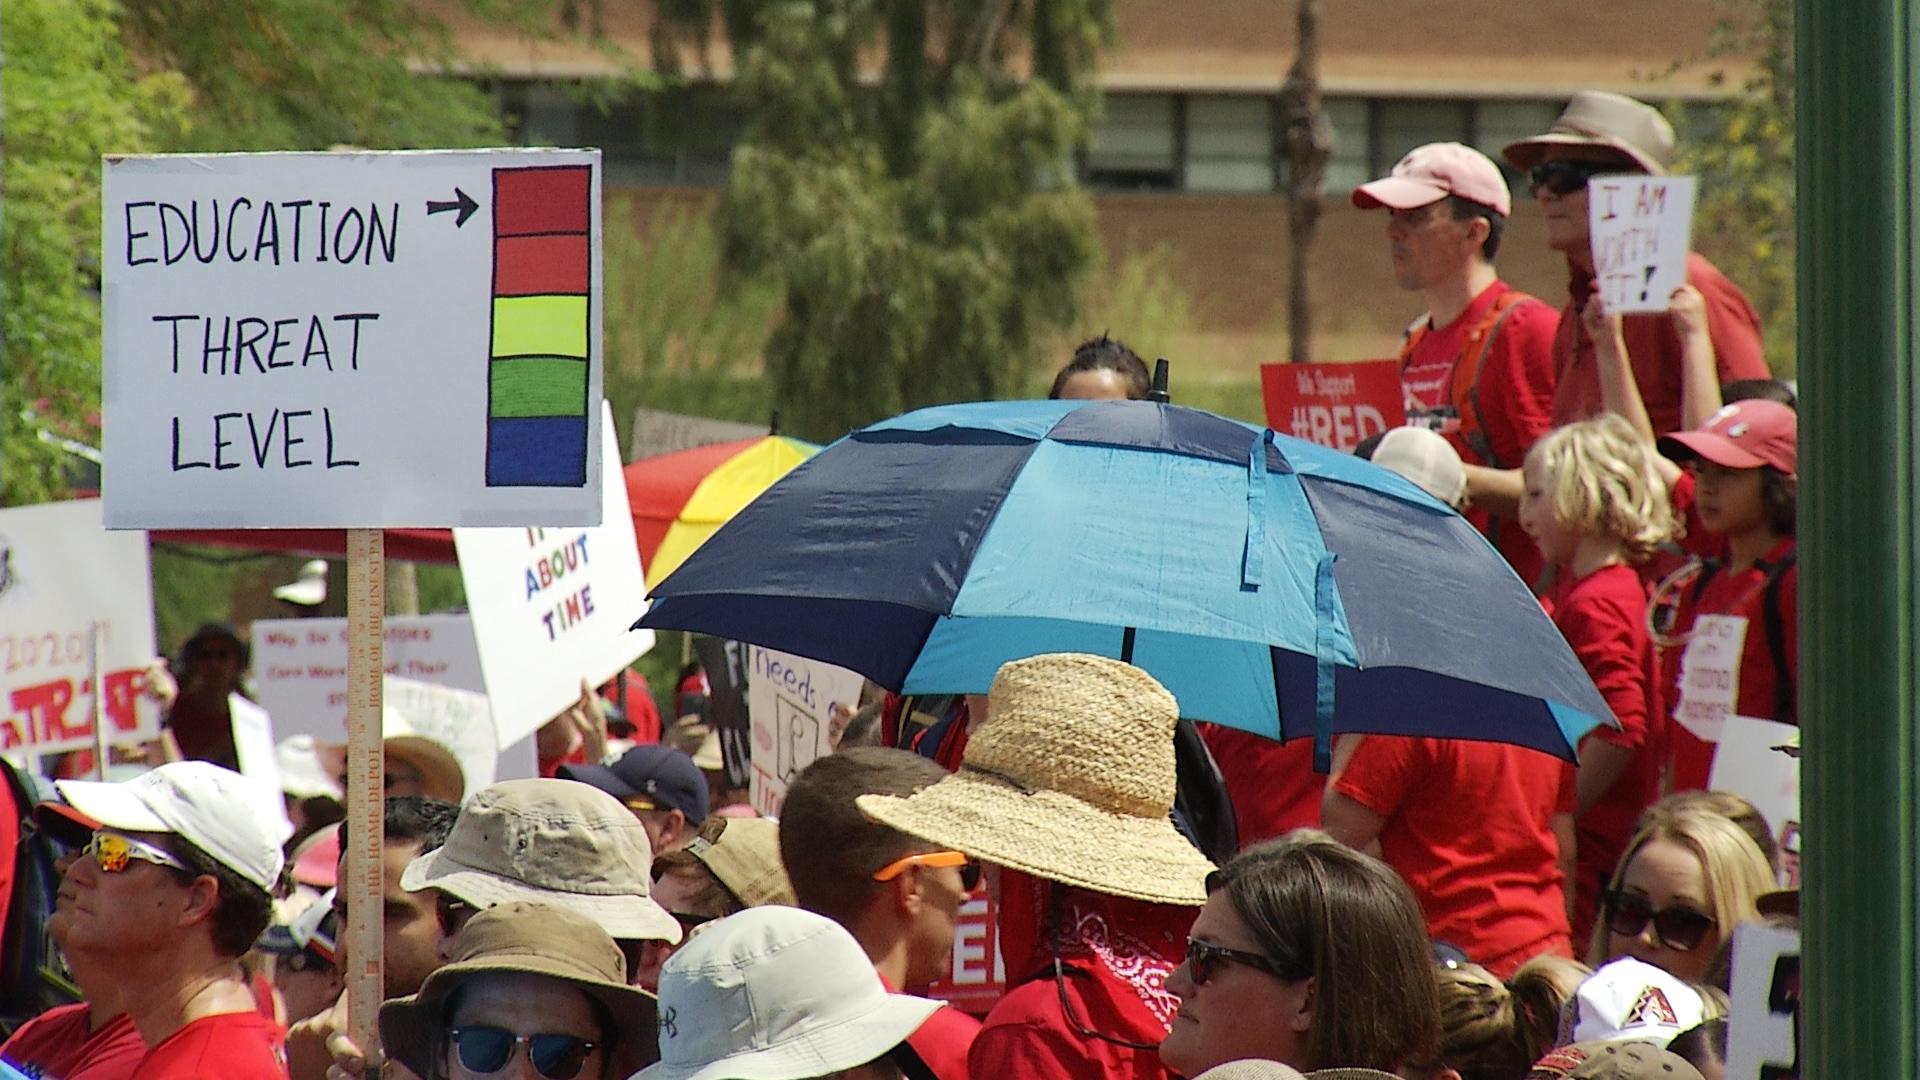 #RedForEd protestors at the Arizona Capitol, Monday, April 30.